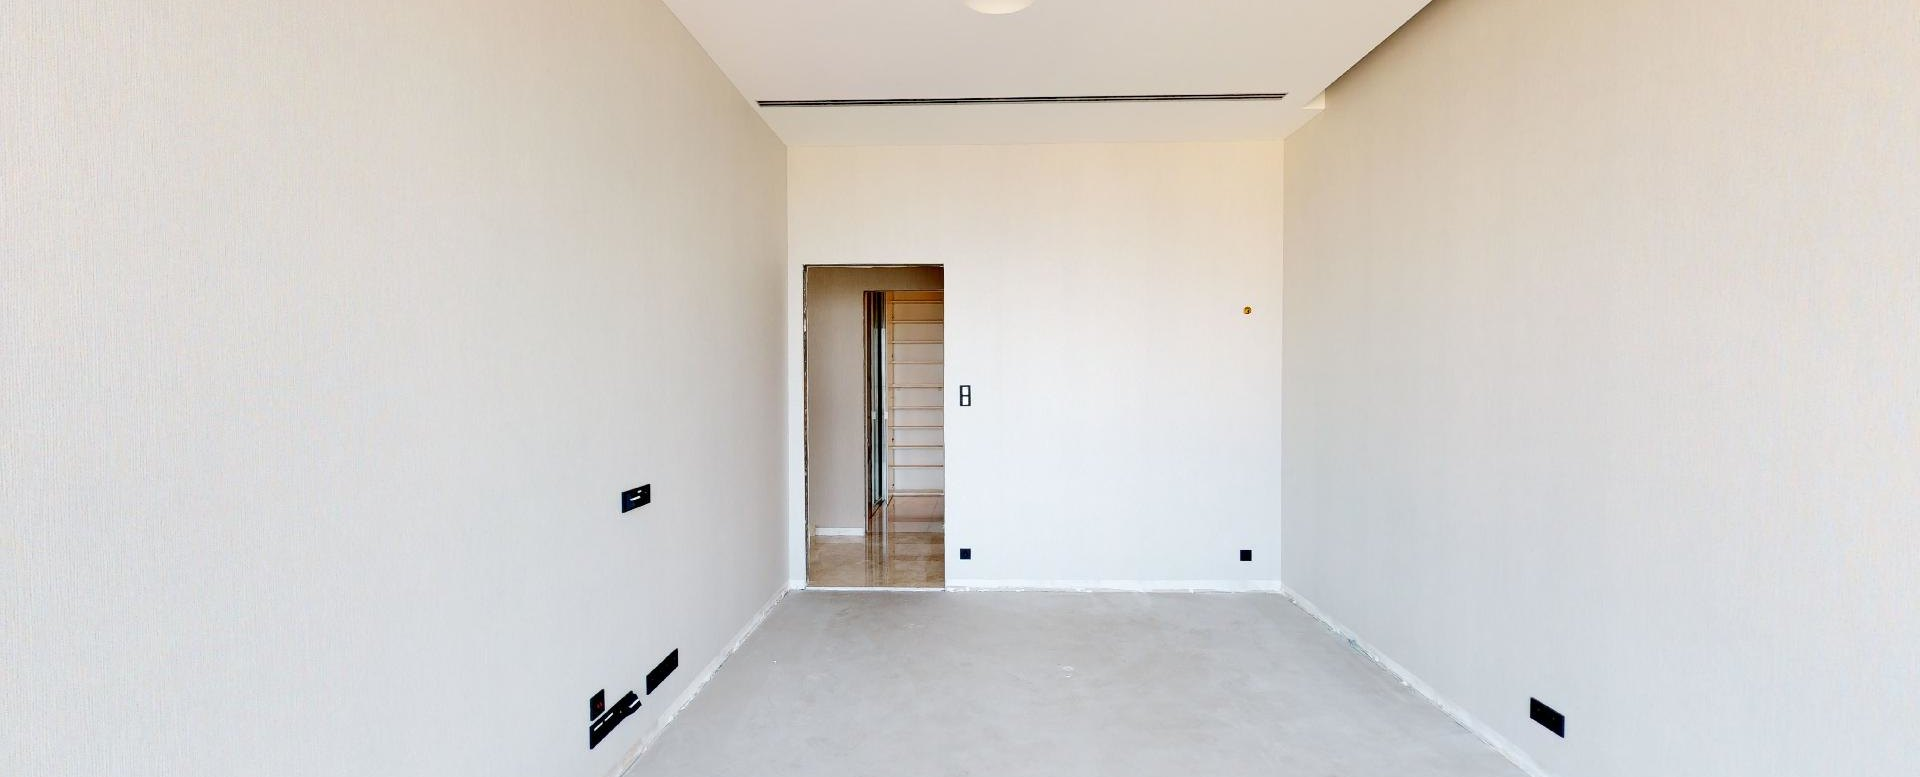 Izba v 3-izbovom penthouse v Panorama Towers